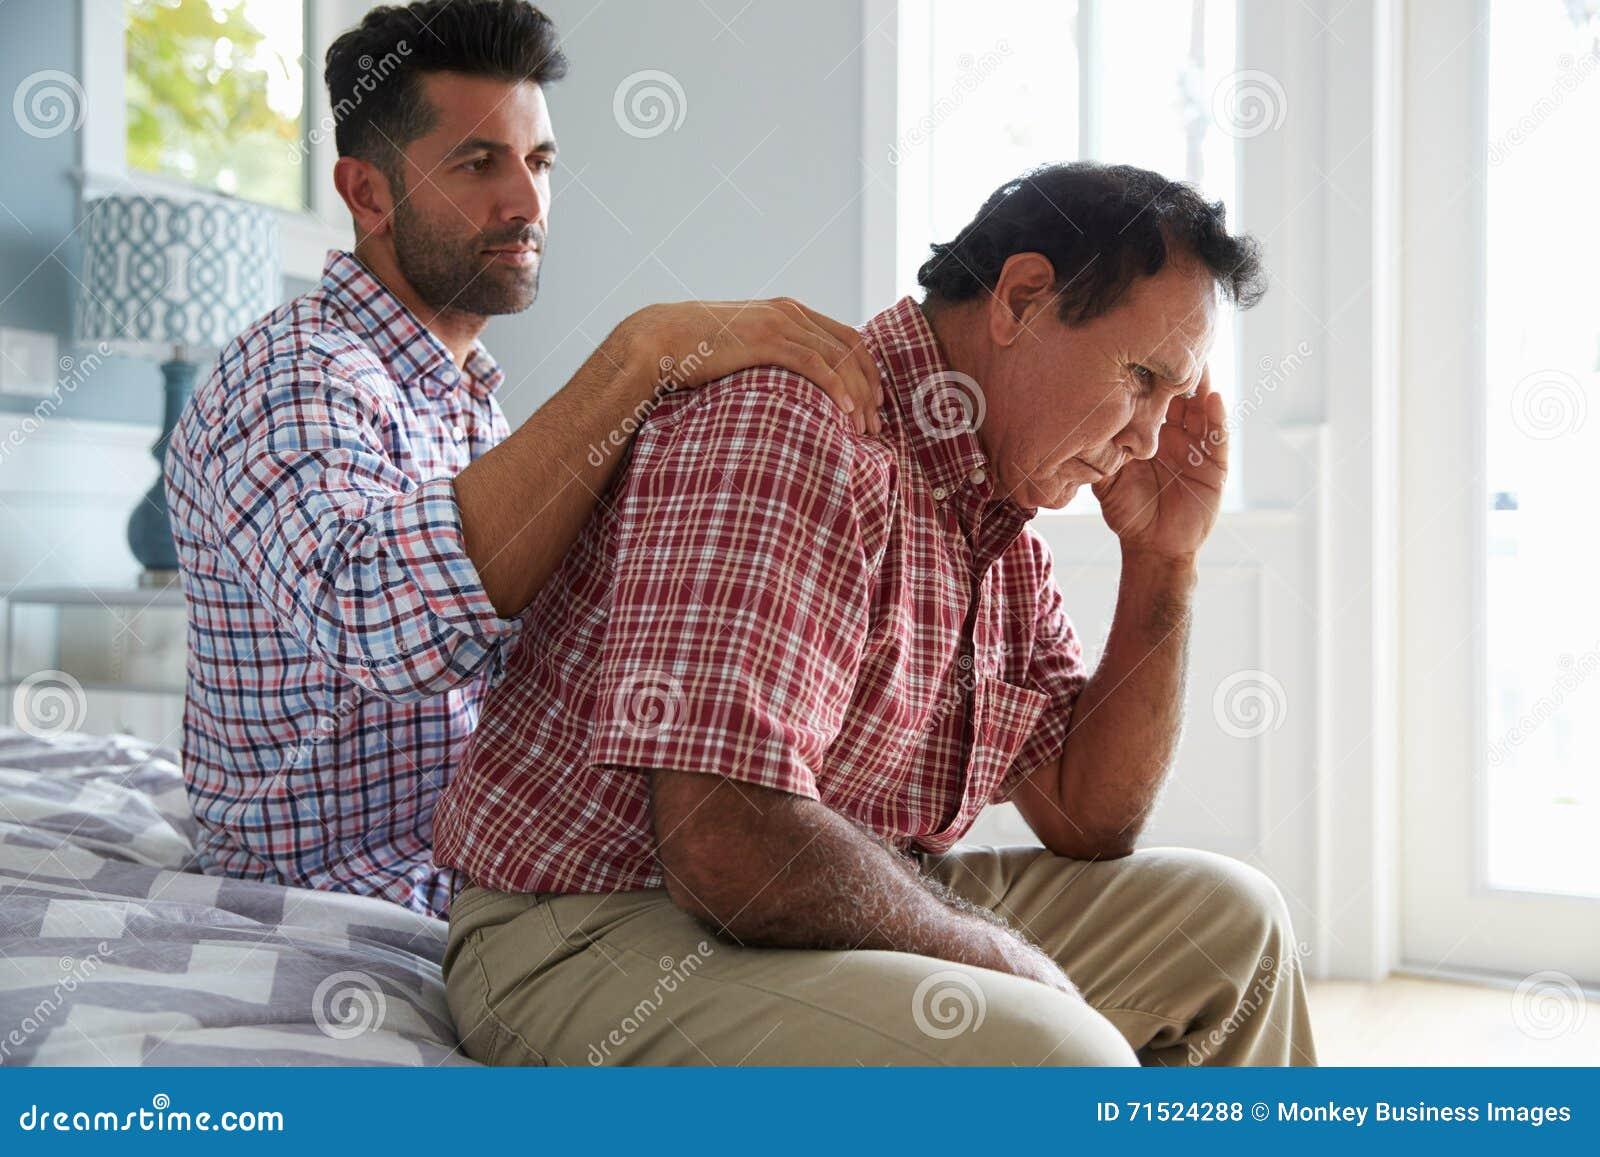 Filho adulto que consola o pai Suffering With Dementia